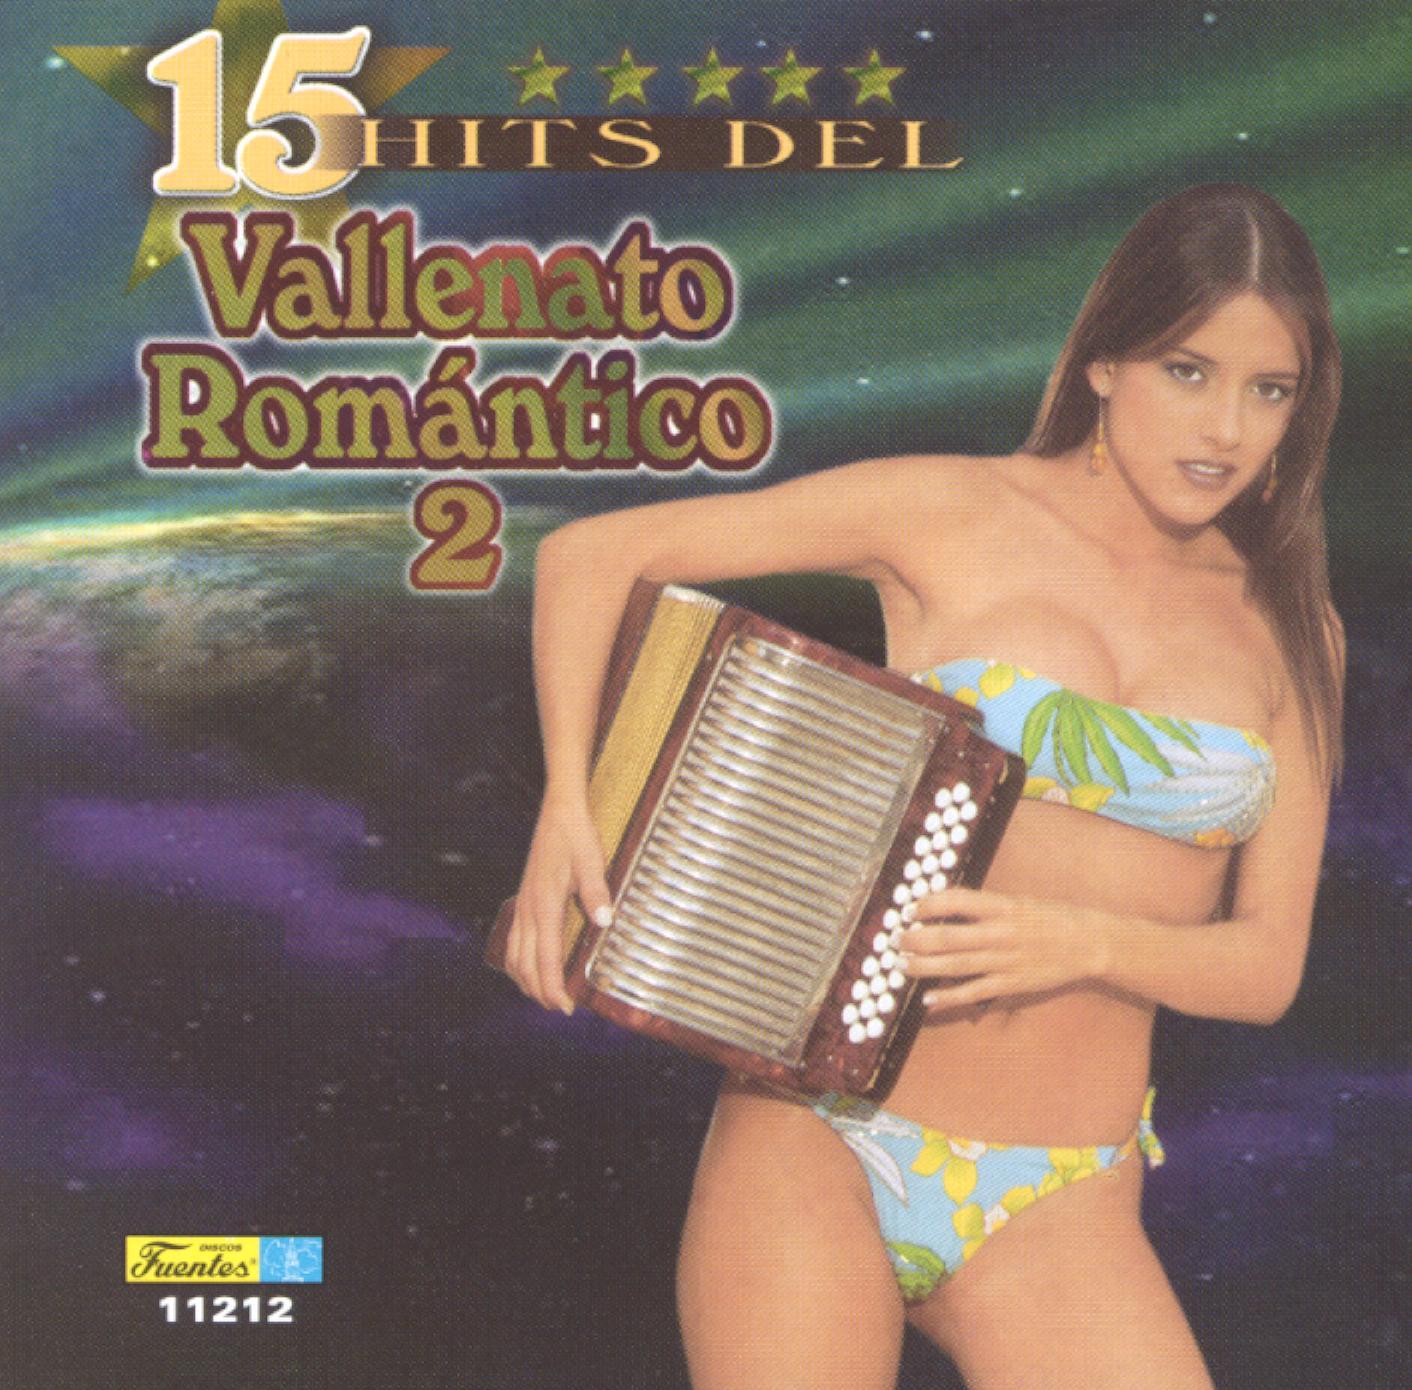 15 Hits del Vallenato Romántico 2